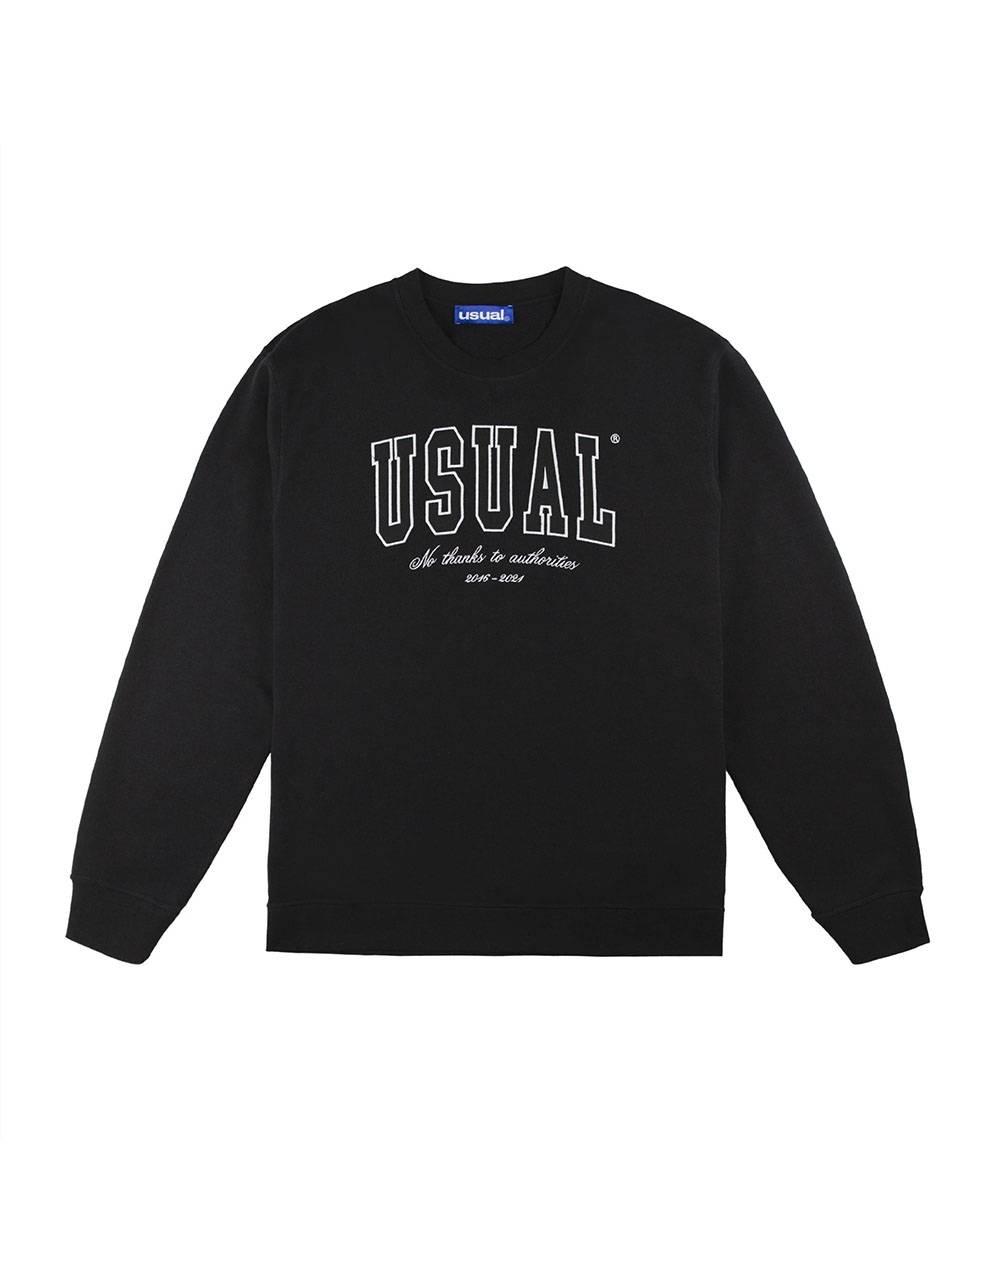 Usual No Thanx Crewneck sweatshirt - black Usual Sweater 115,00€